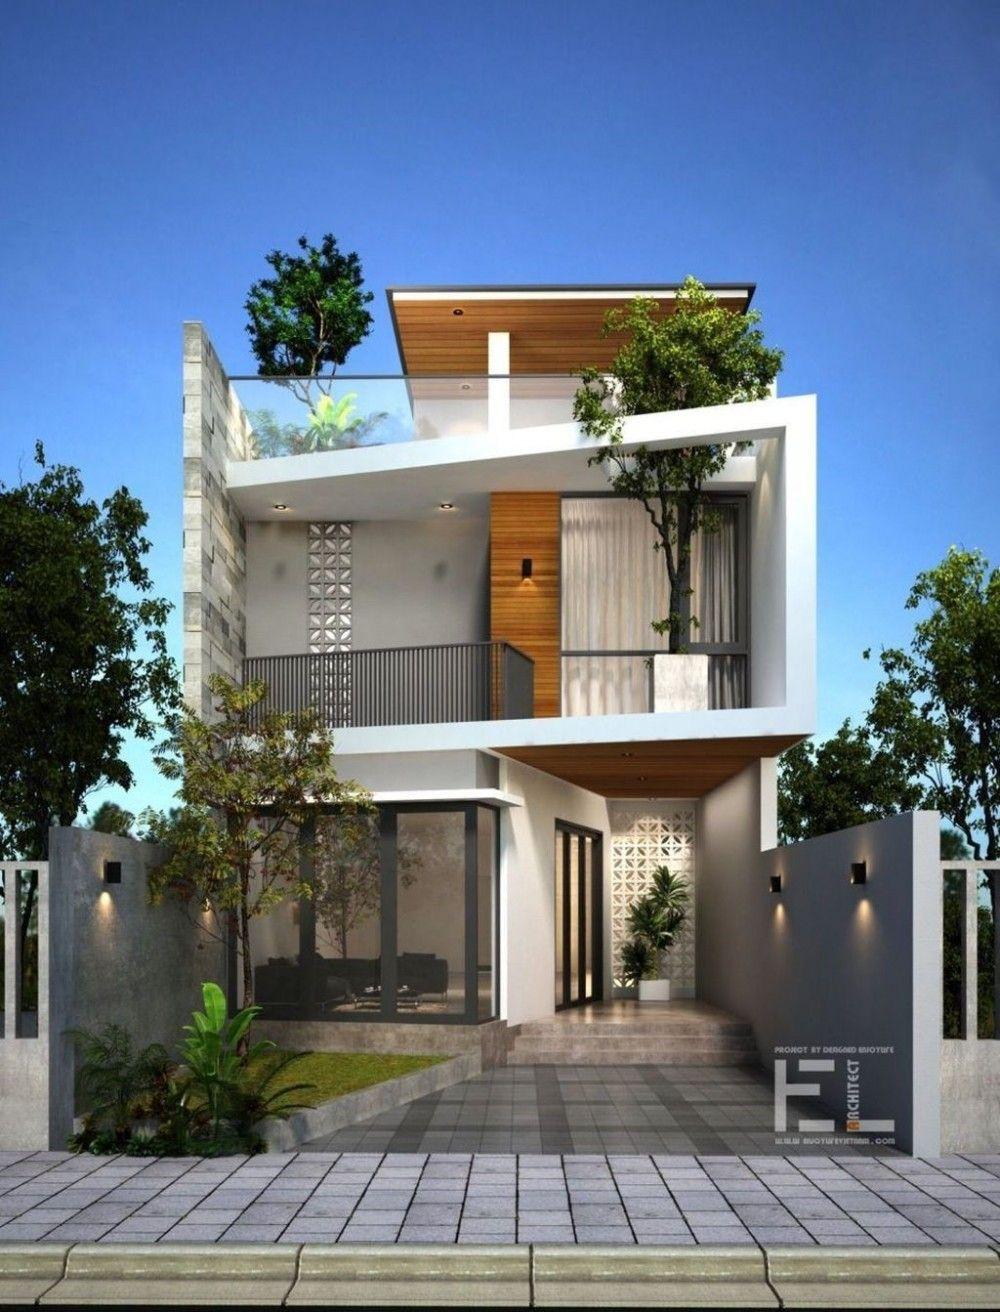 Architettura Case Moderne Idee modern interior house design trend for 2020 nel 2020 | case